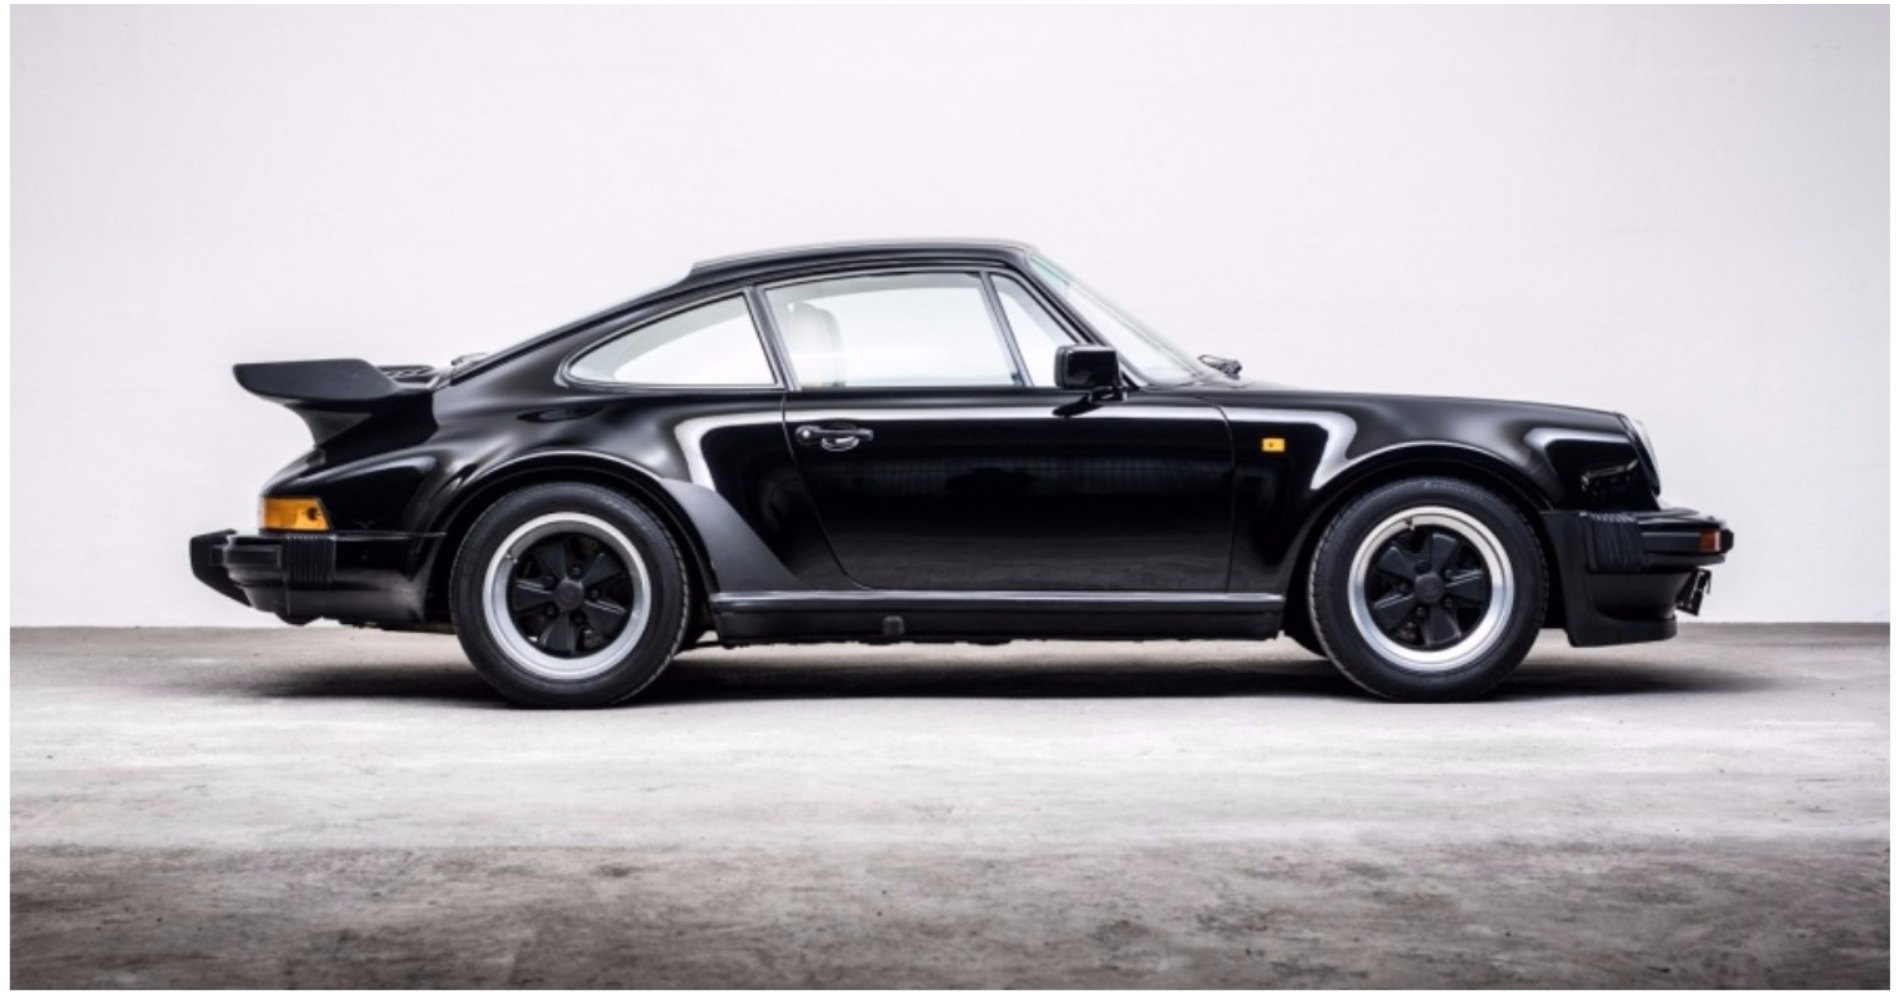 Porsche 911 TURBO (1977)